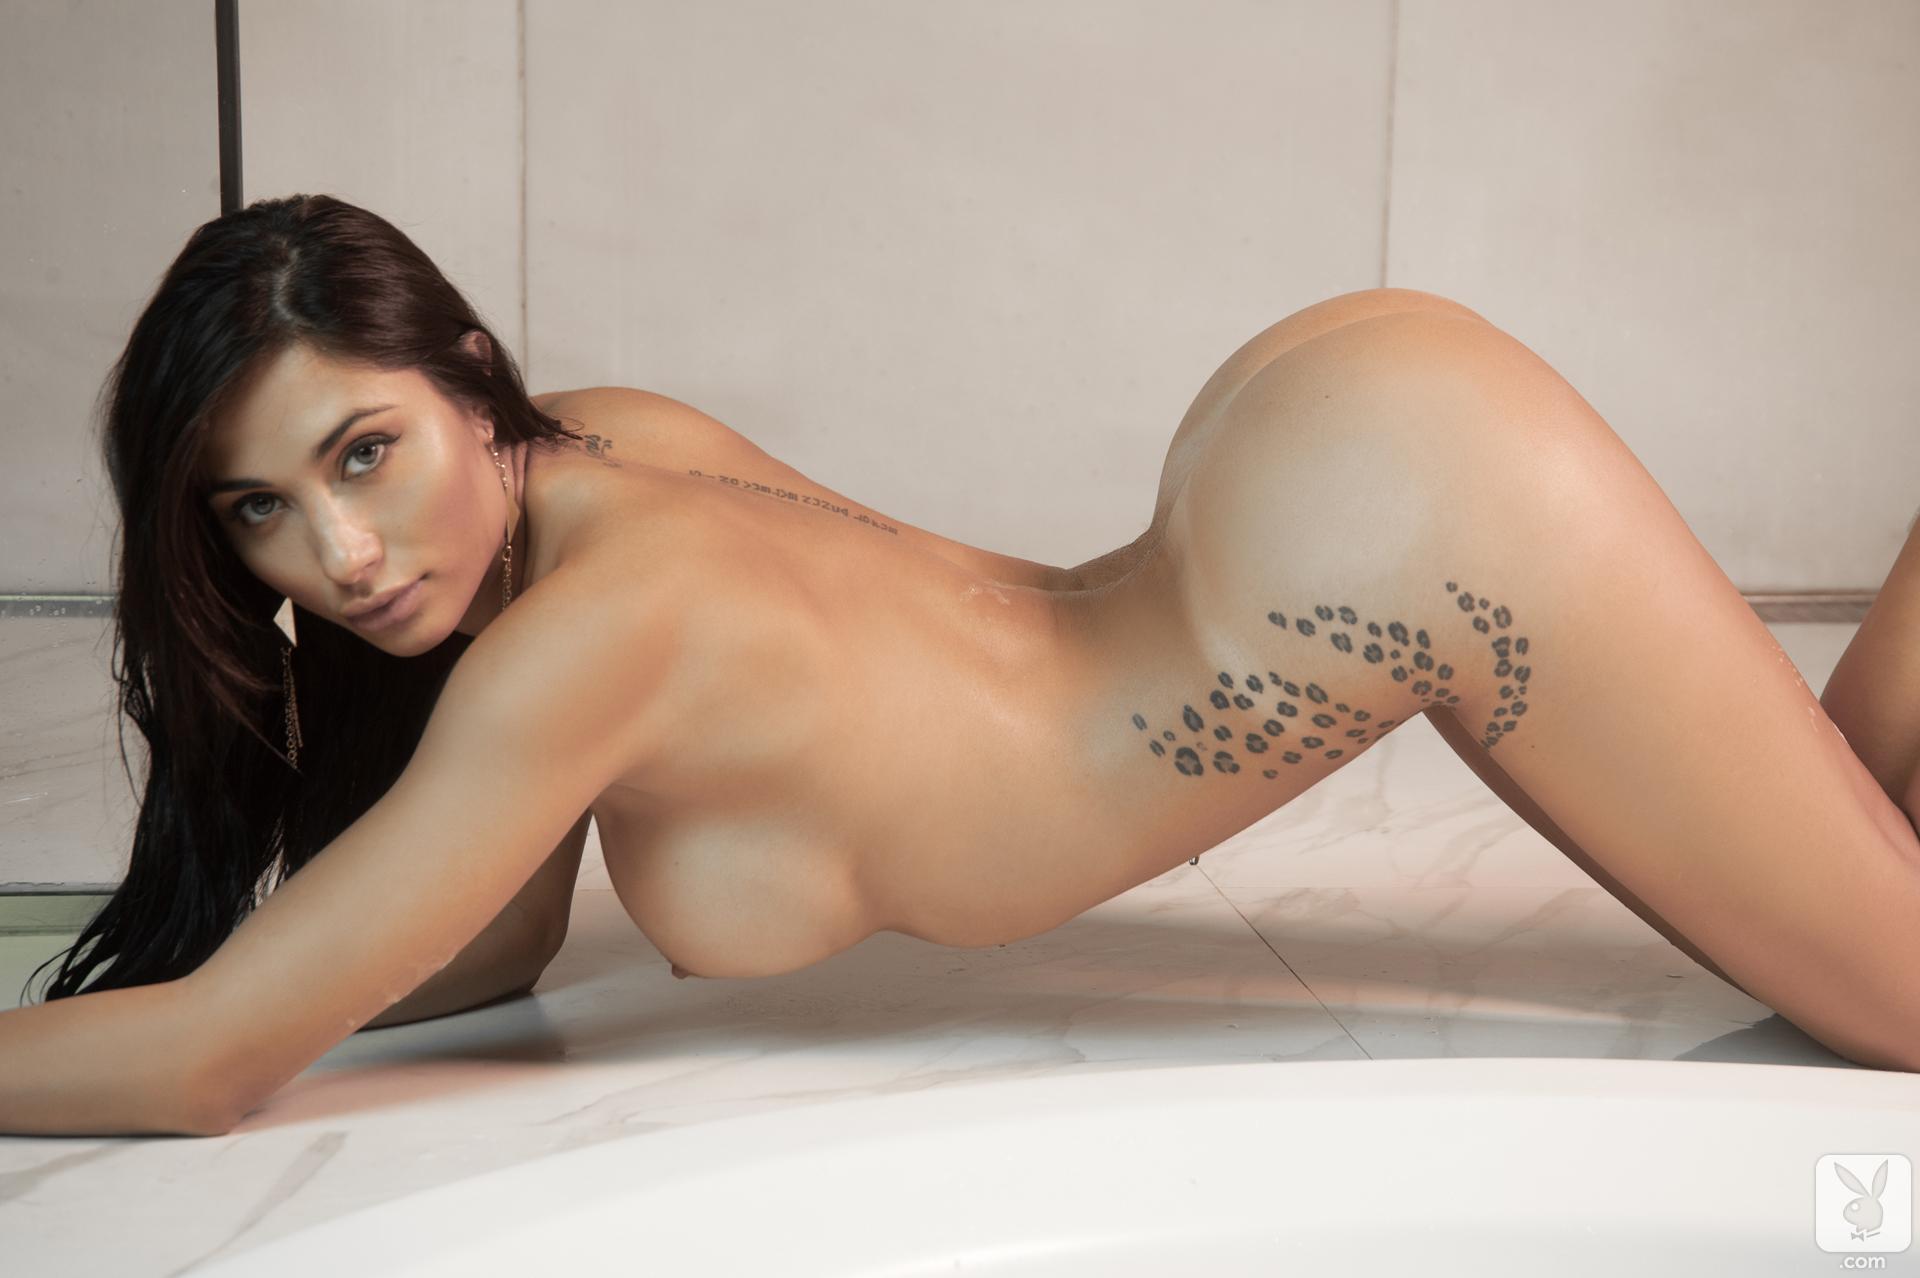 hot-nude-hispanics-white-girl-cum-dump